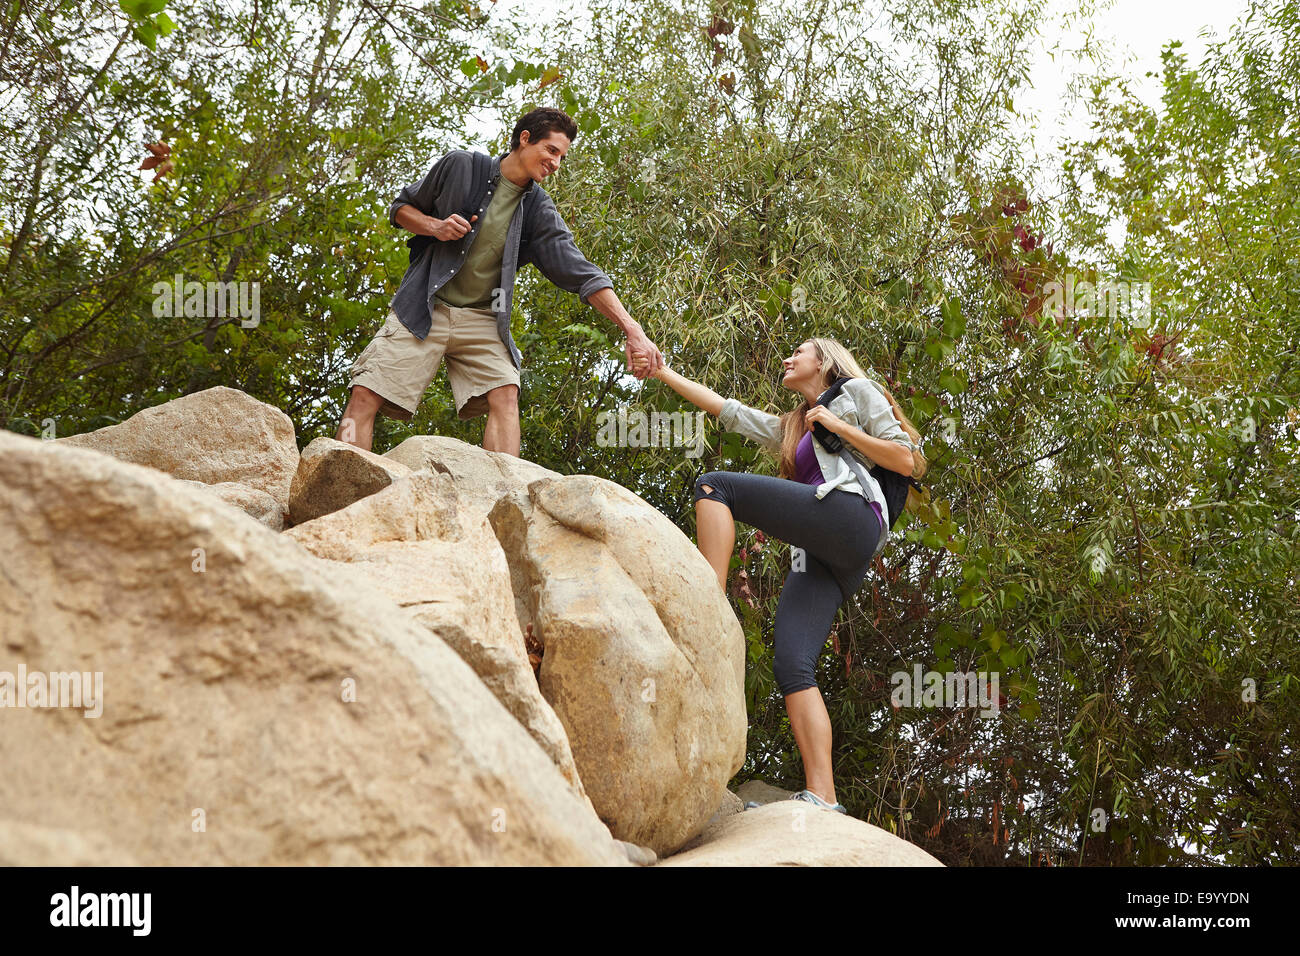 Couple rock climbing - Stock Image